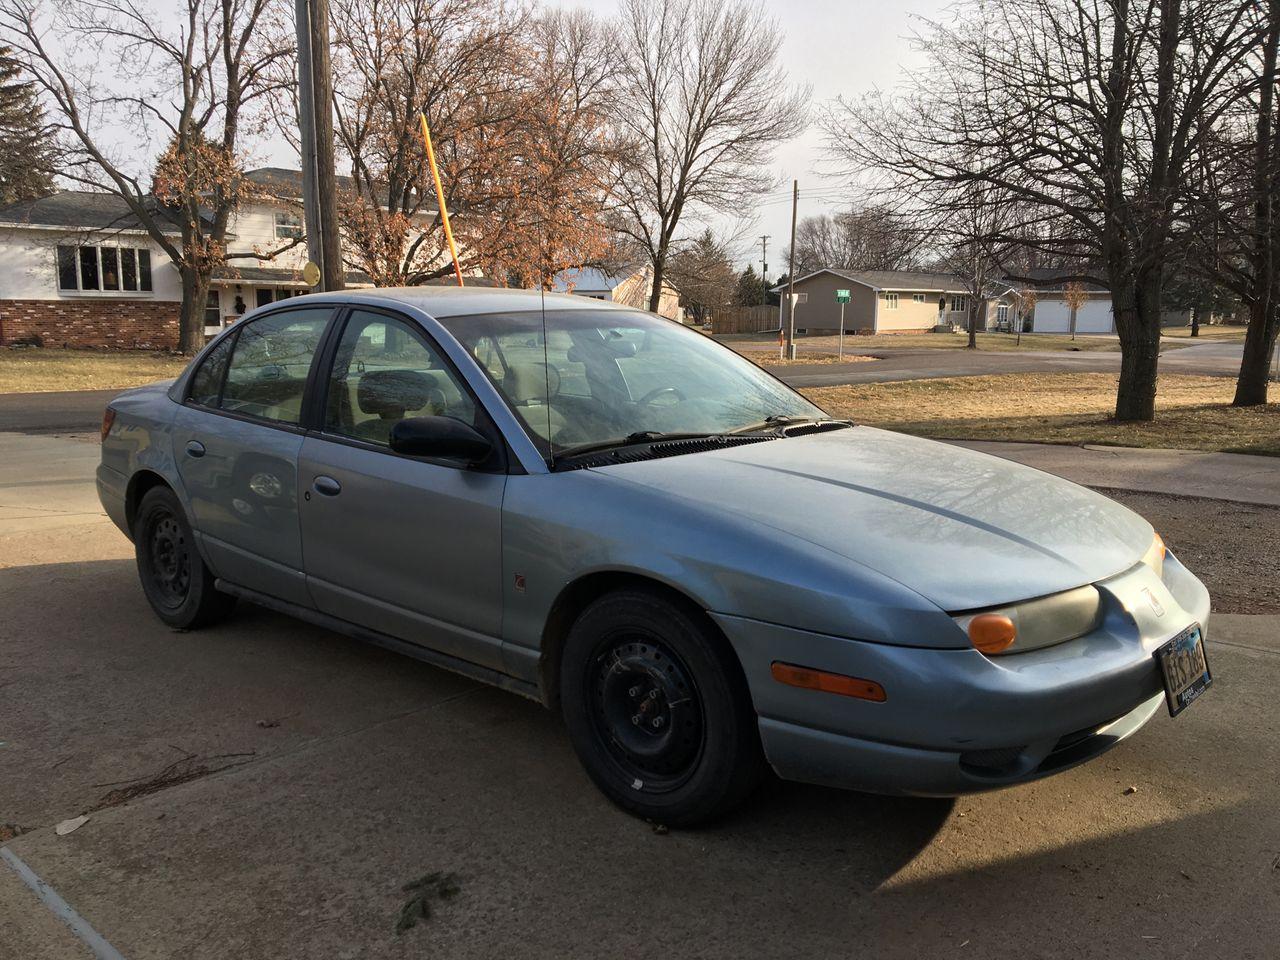 2002 Saturn S-Series SL2 | Marion, SD, Blue (Blue), Front Wheel